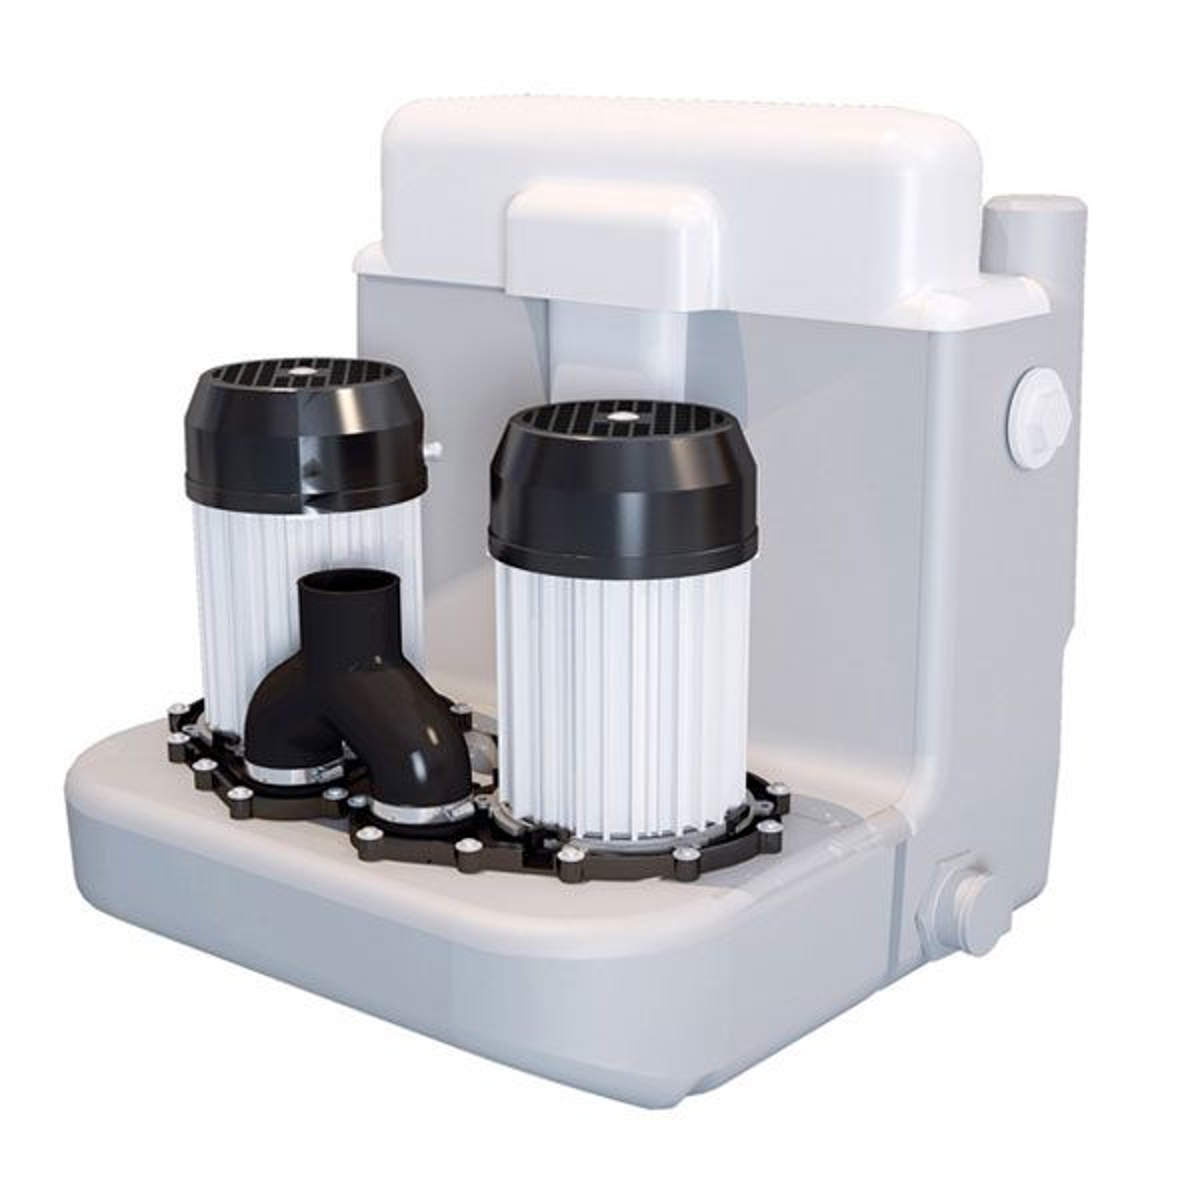 Sanicom2 Dual Motor Pump